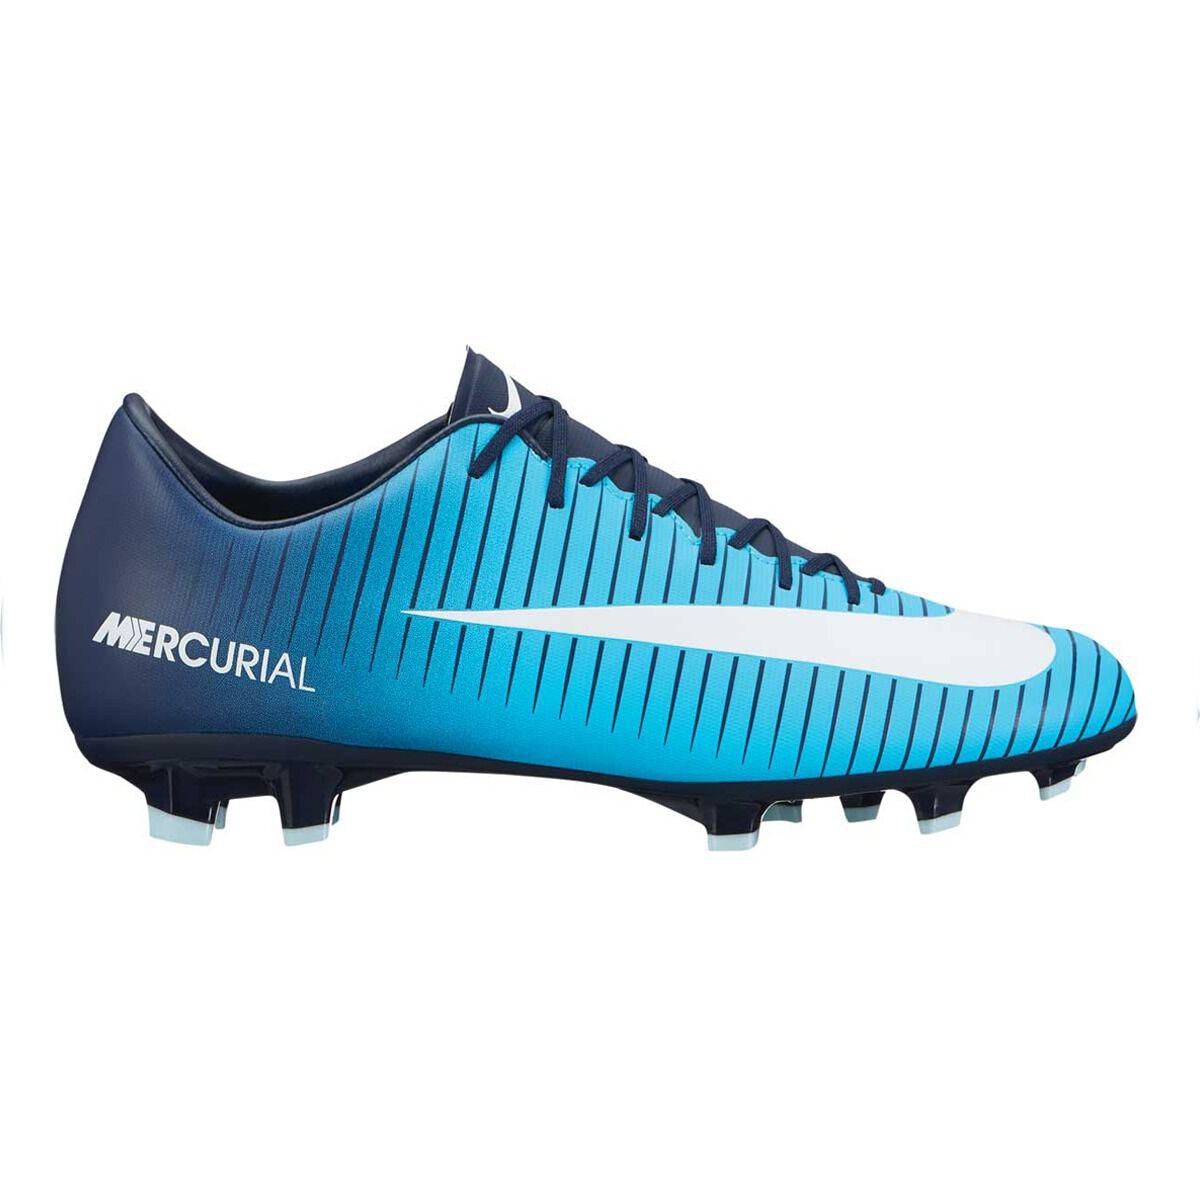 Nike Mercurial Victory VI Mens Football Boots Blue / Navy US 10.5 Adult